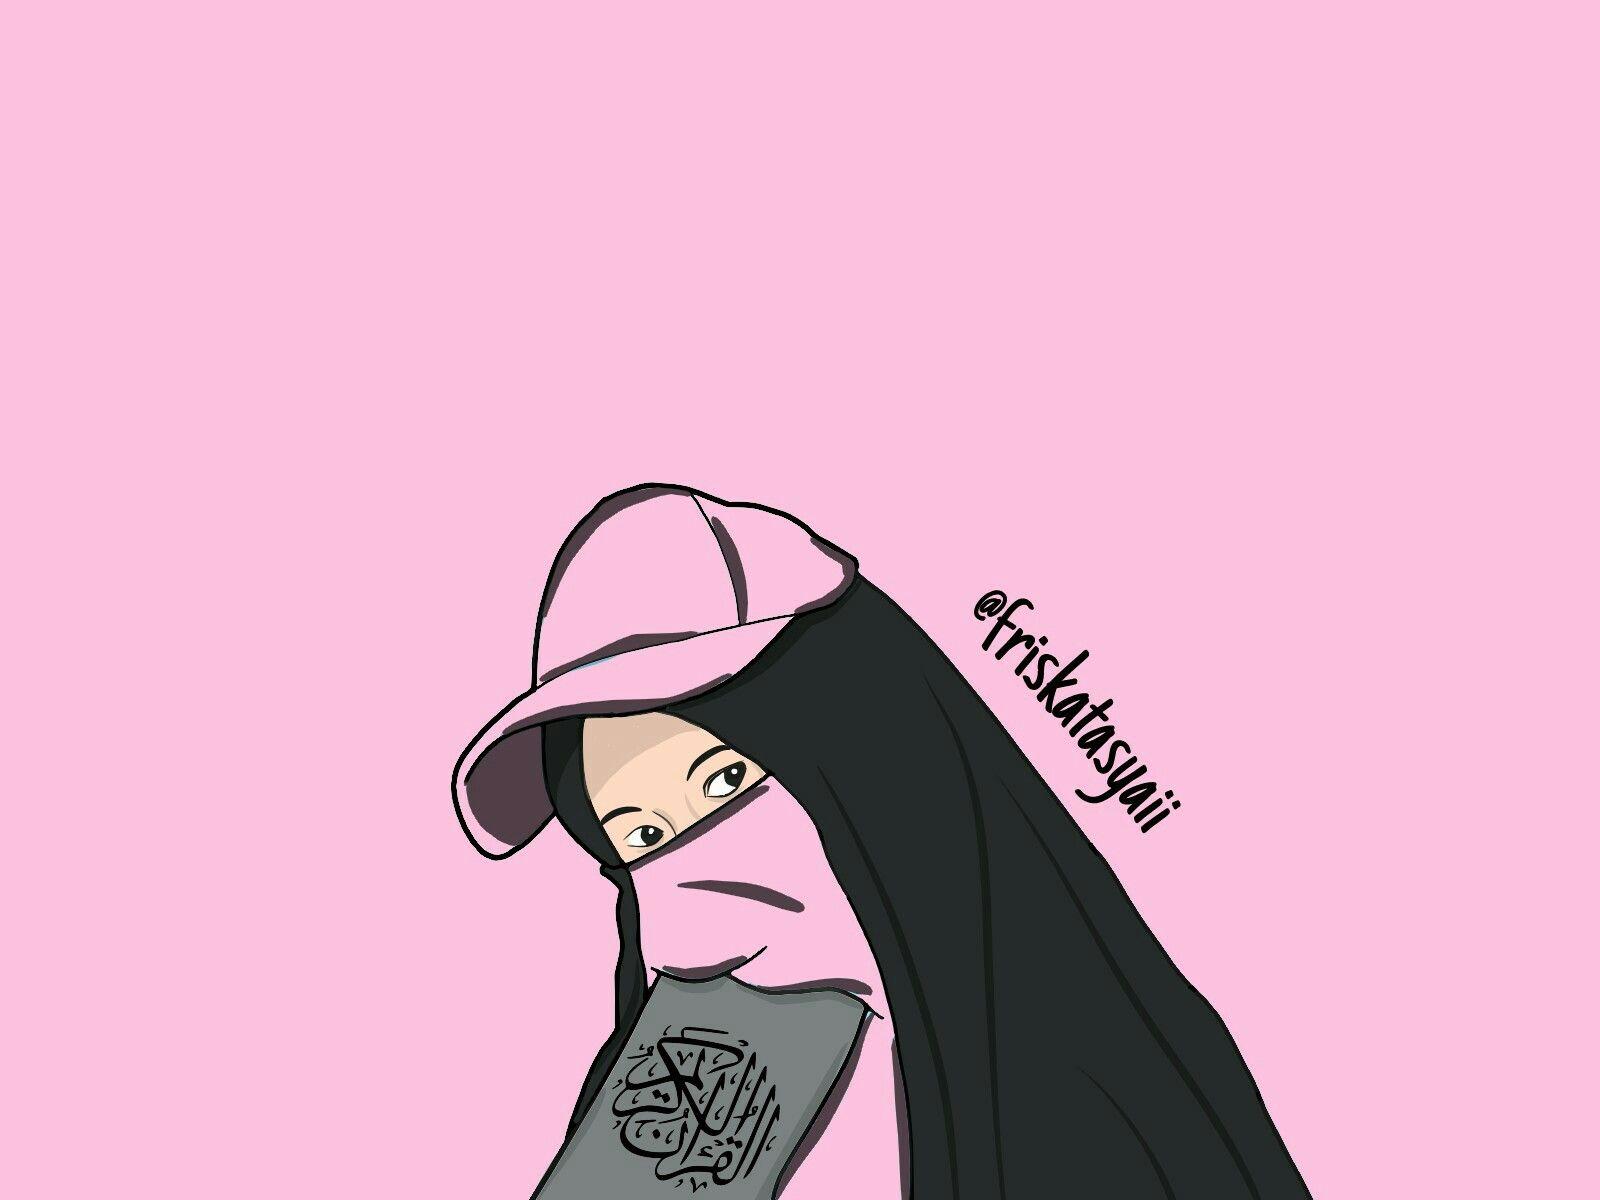 Foto Muslimah Bercadar Niqob Yaman Indah Frt Kartun Muslim